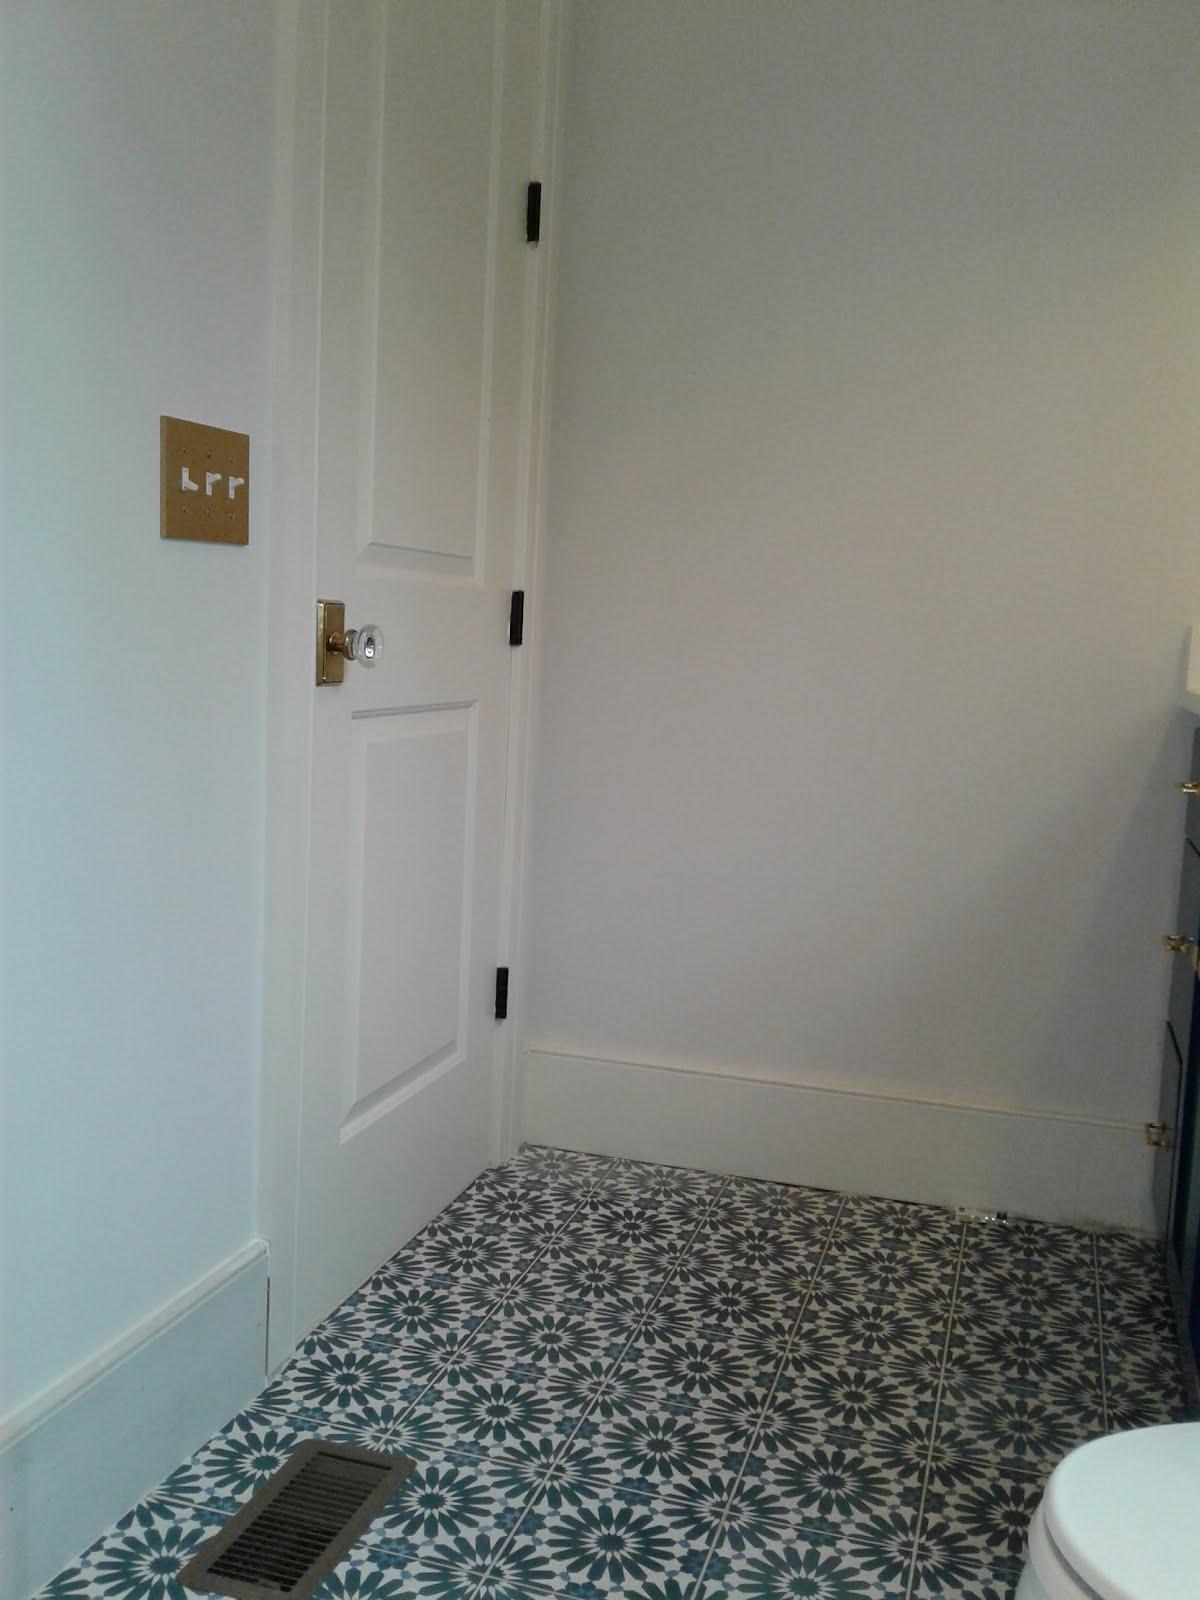 Our tile work passuluna concrete ceramic tile instal dailygadgetfo Image collections